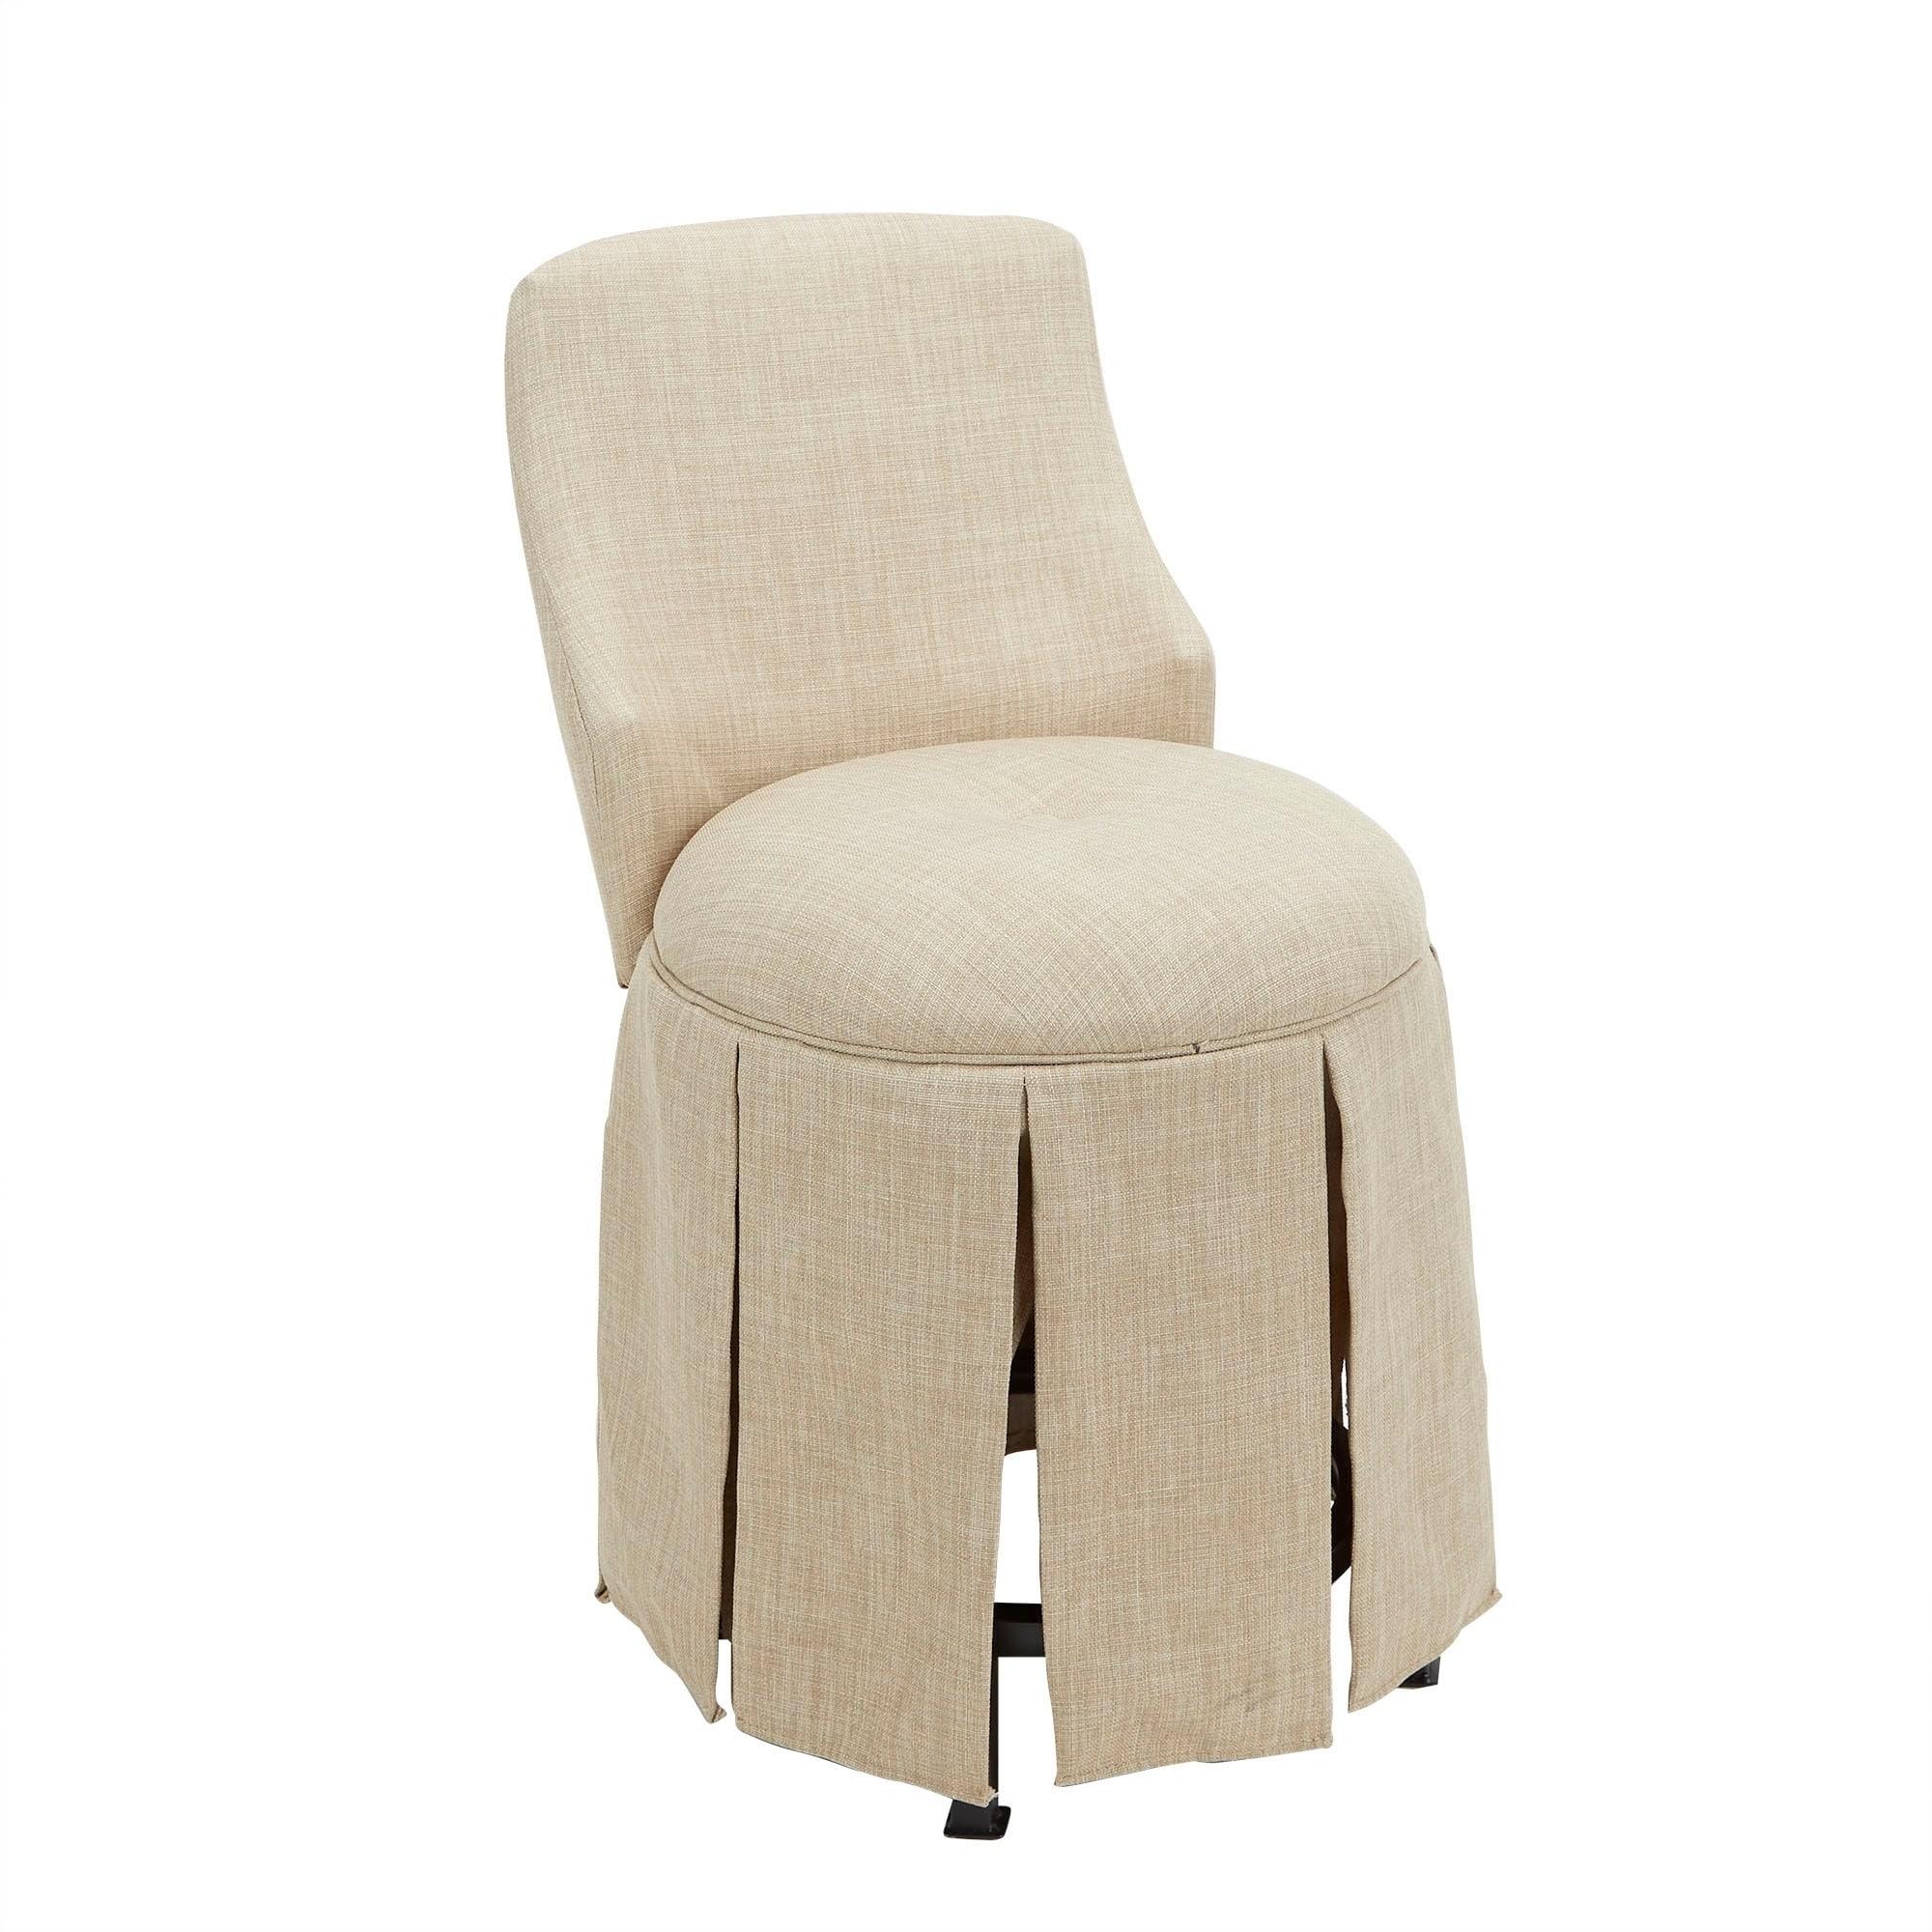 Sullivan Skirted Swivel Vanity Chair With Back Overstock 26040092